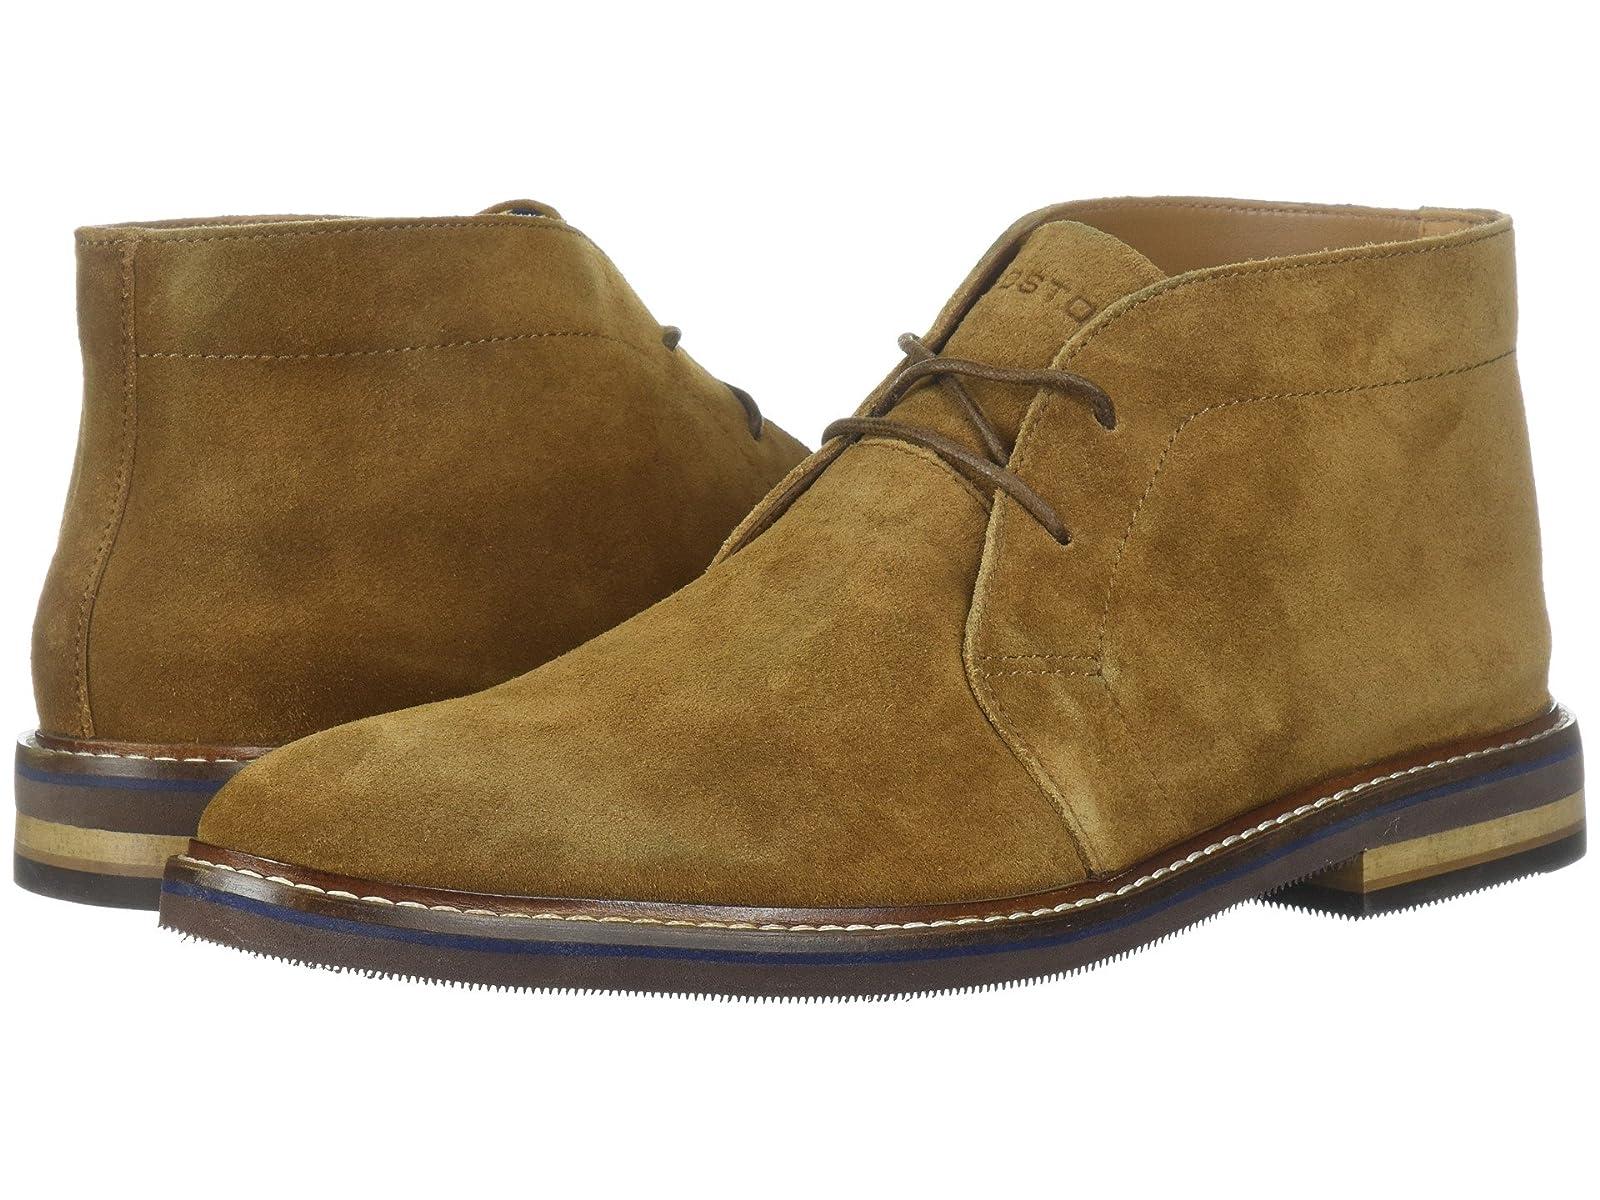 Bostonian Dezmin MidSelling fashionable and eye-catching shoes